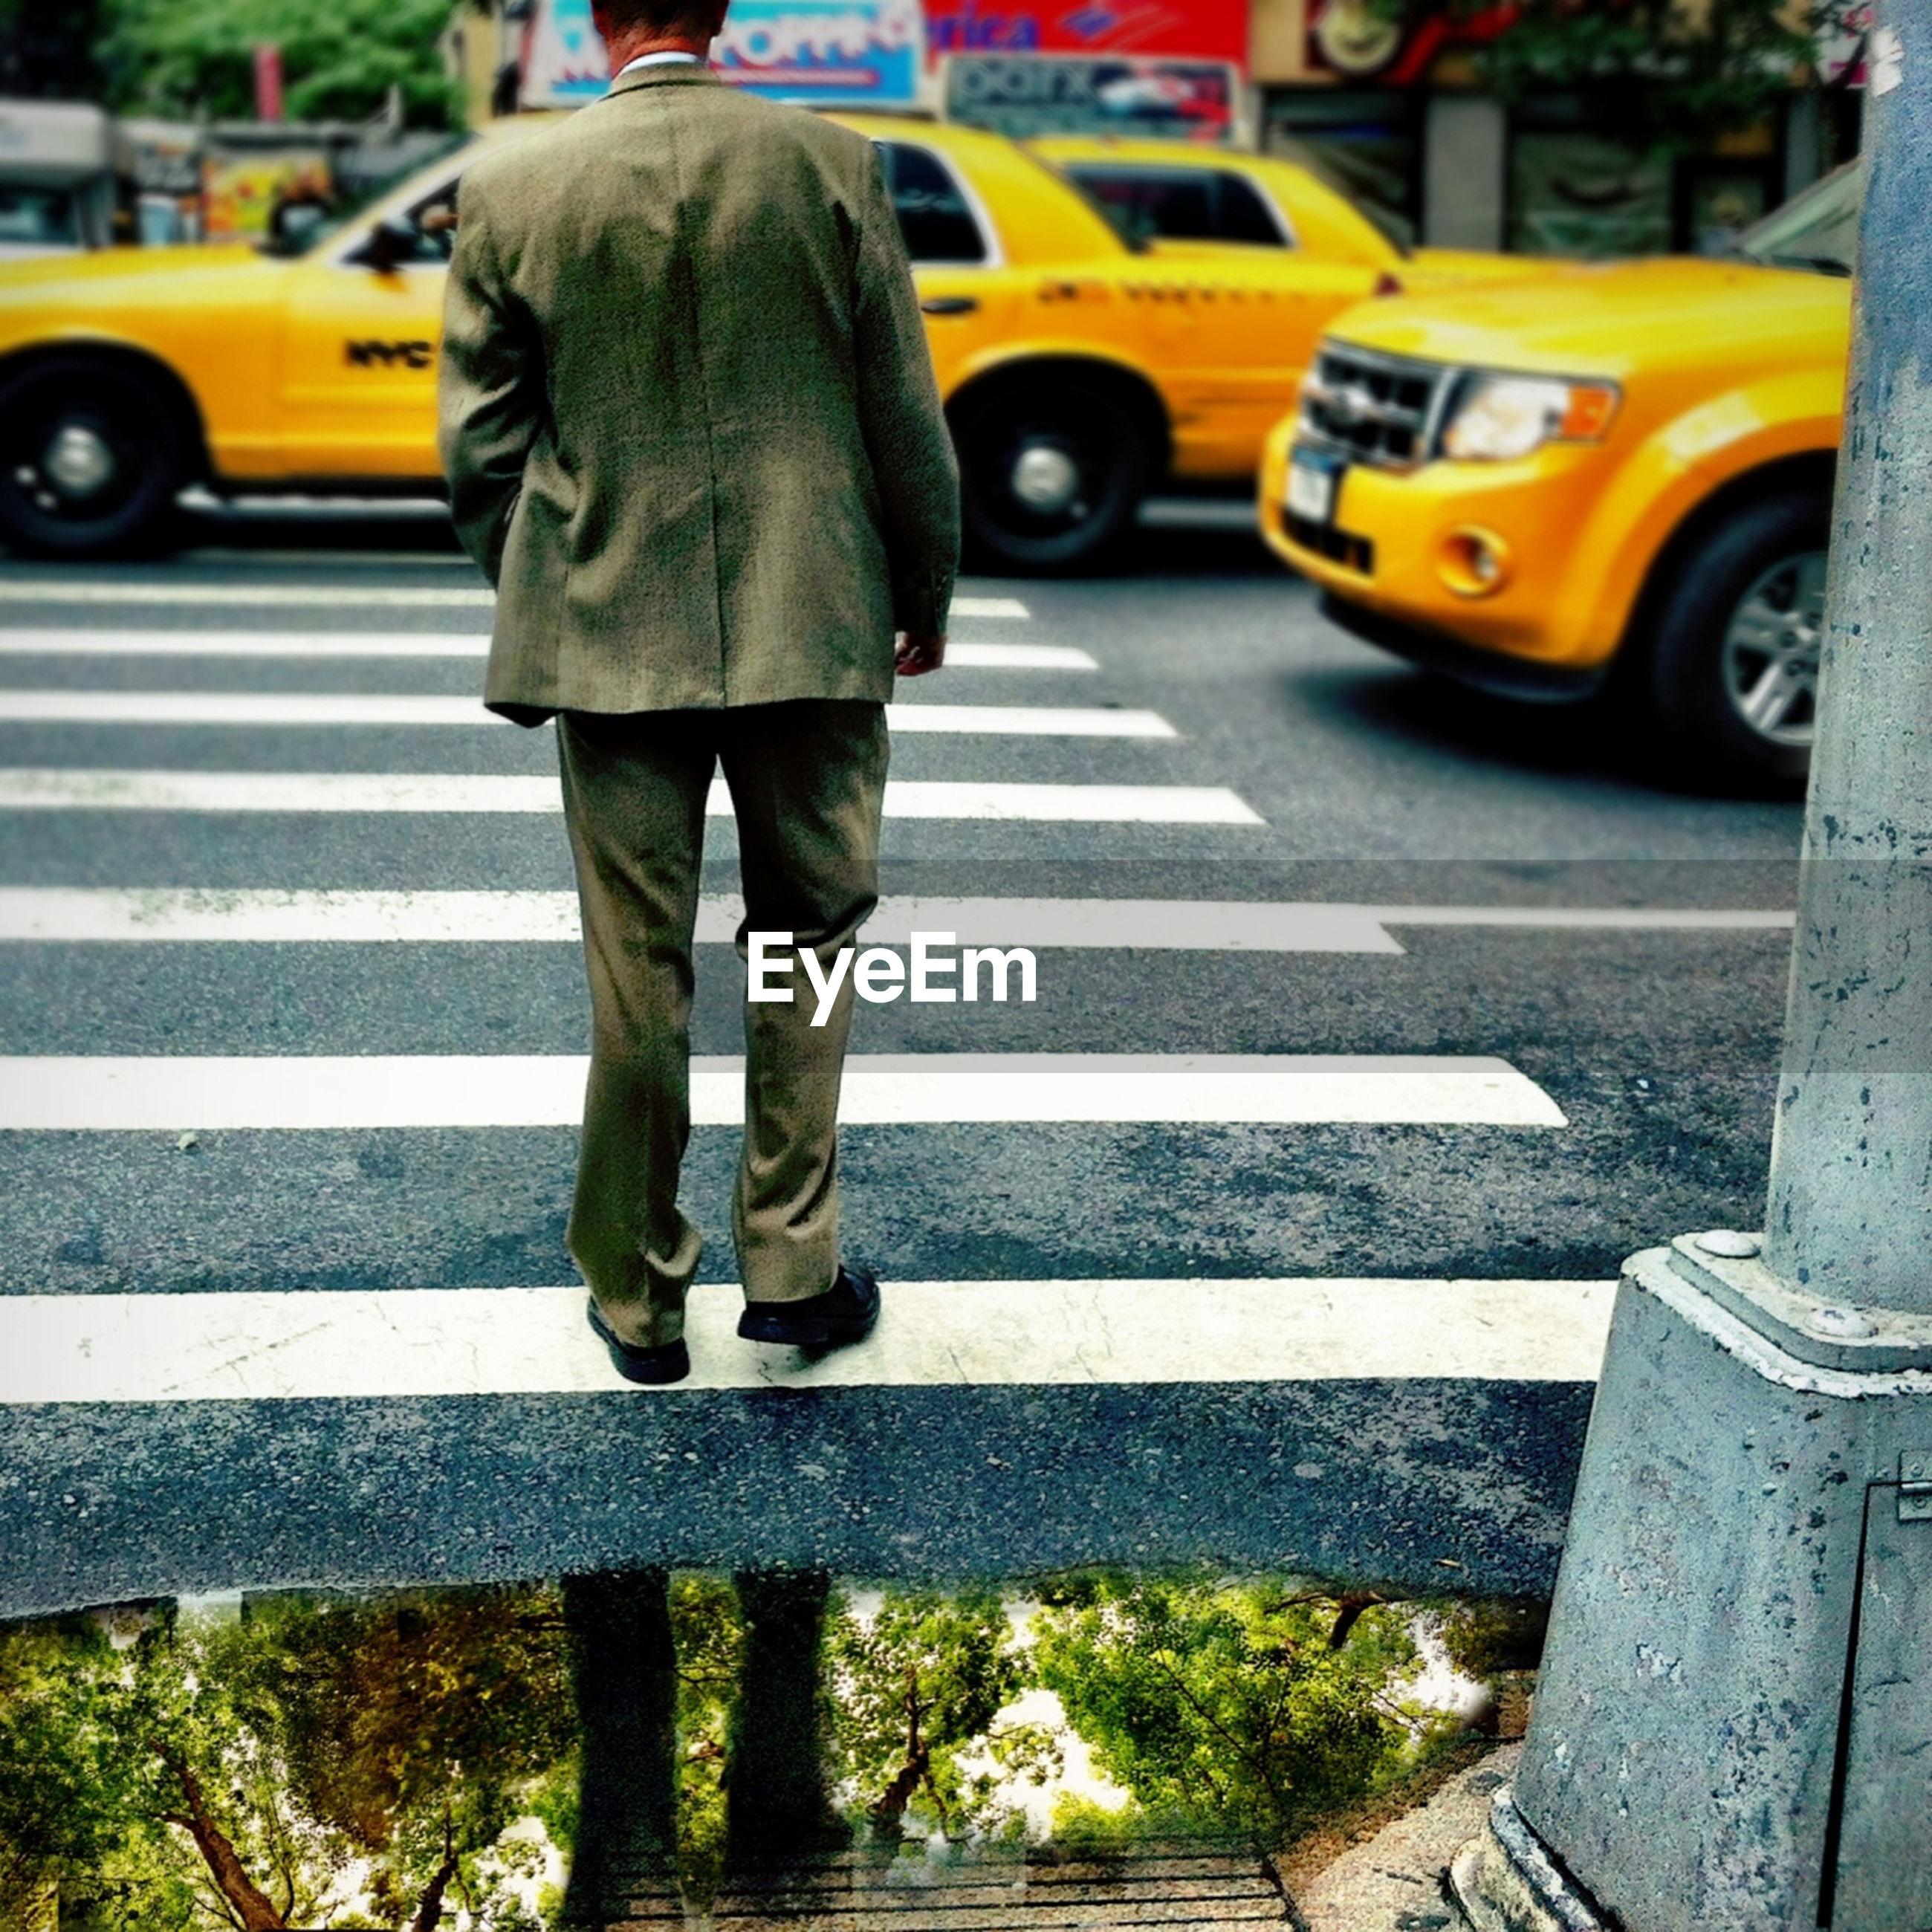 transportation, mode of transport, car, street, land vehicle, road, road marking, city, zebra crossing, on the move, rear view, city life, men, travel, walking, asphalt, day, outdoors